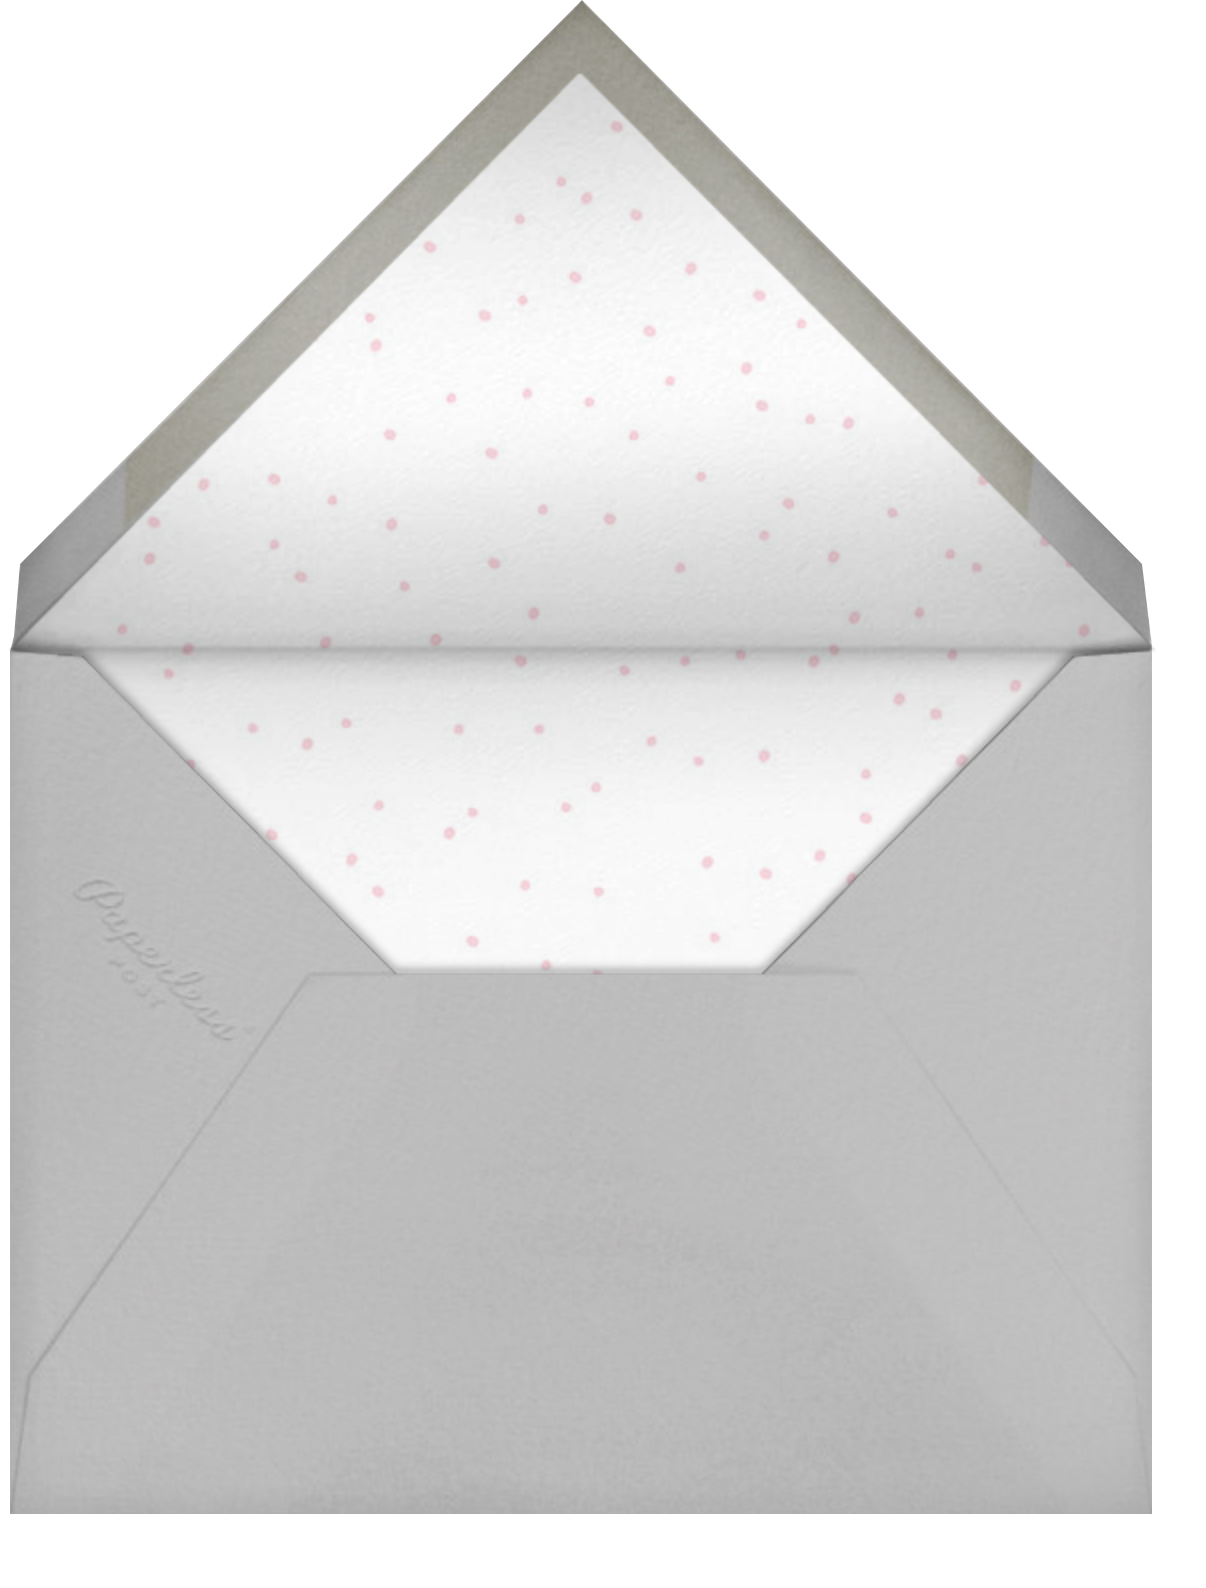 Baby Bunny Photo - Little Cube - 1st birthday - envelope back